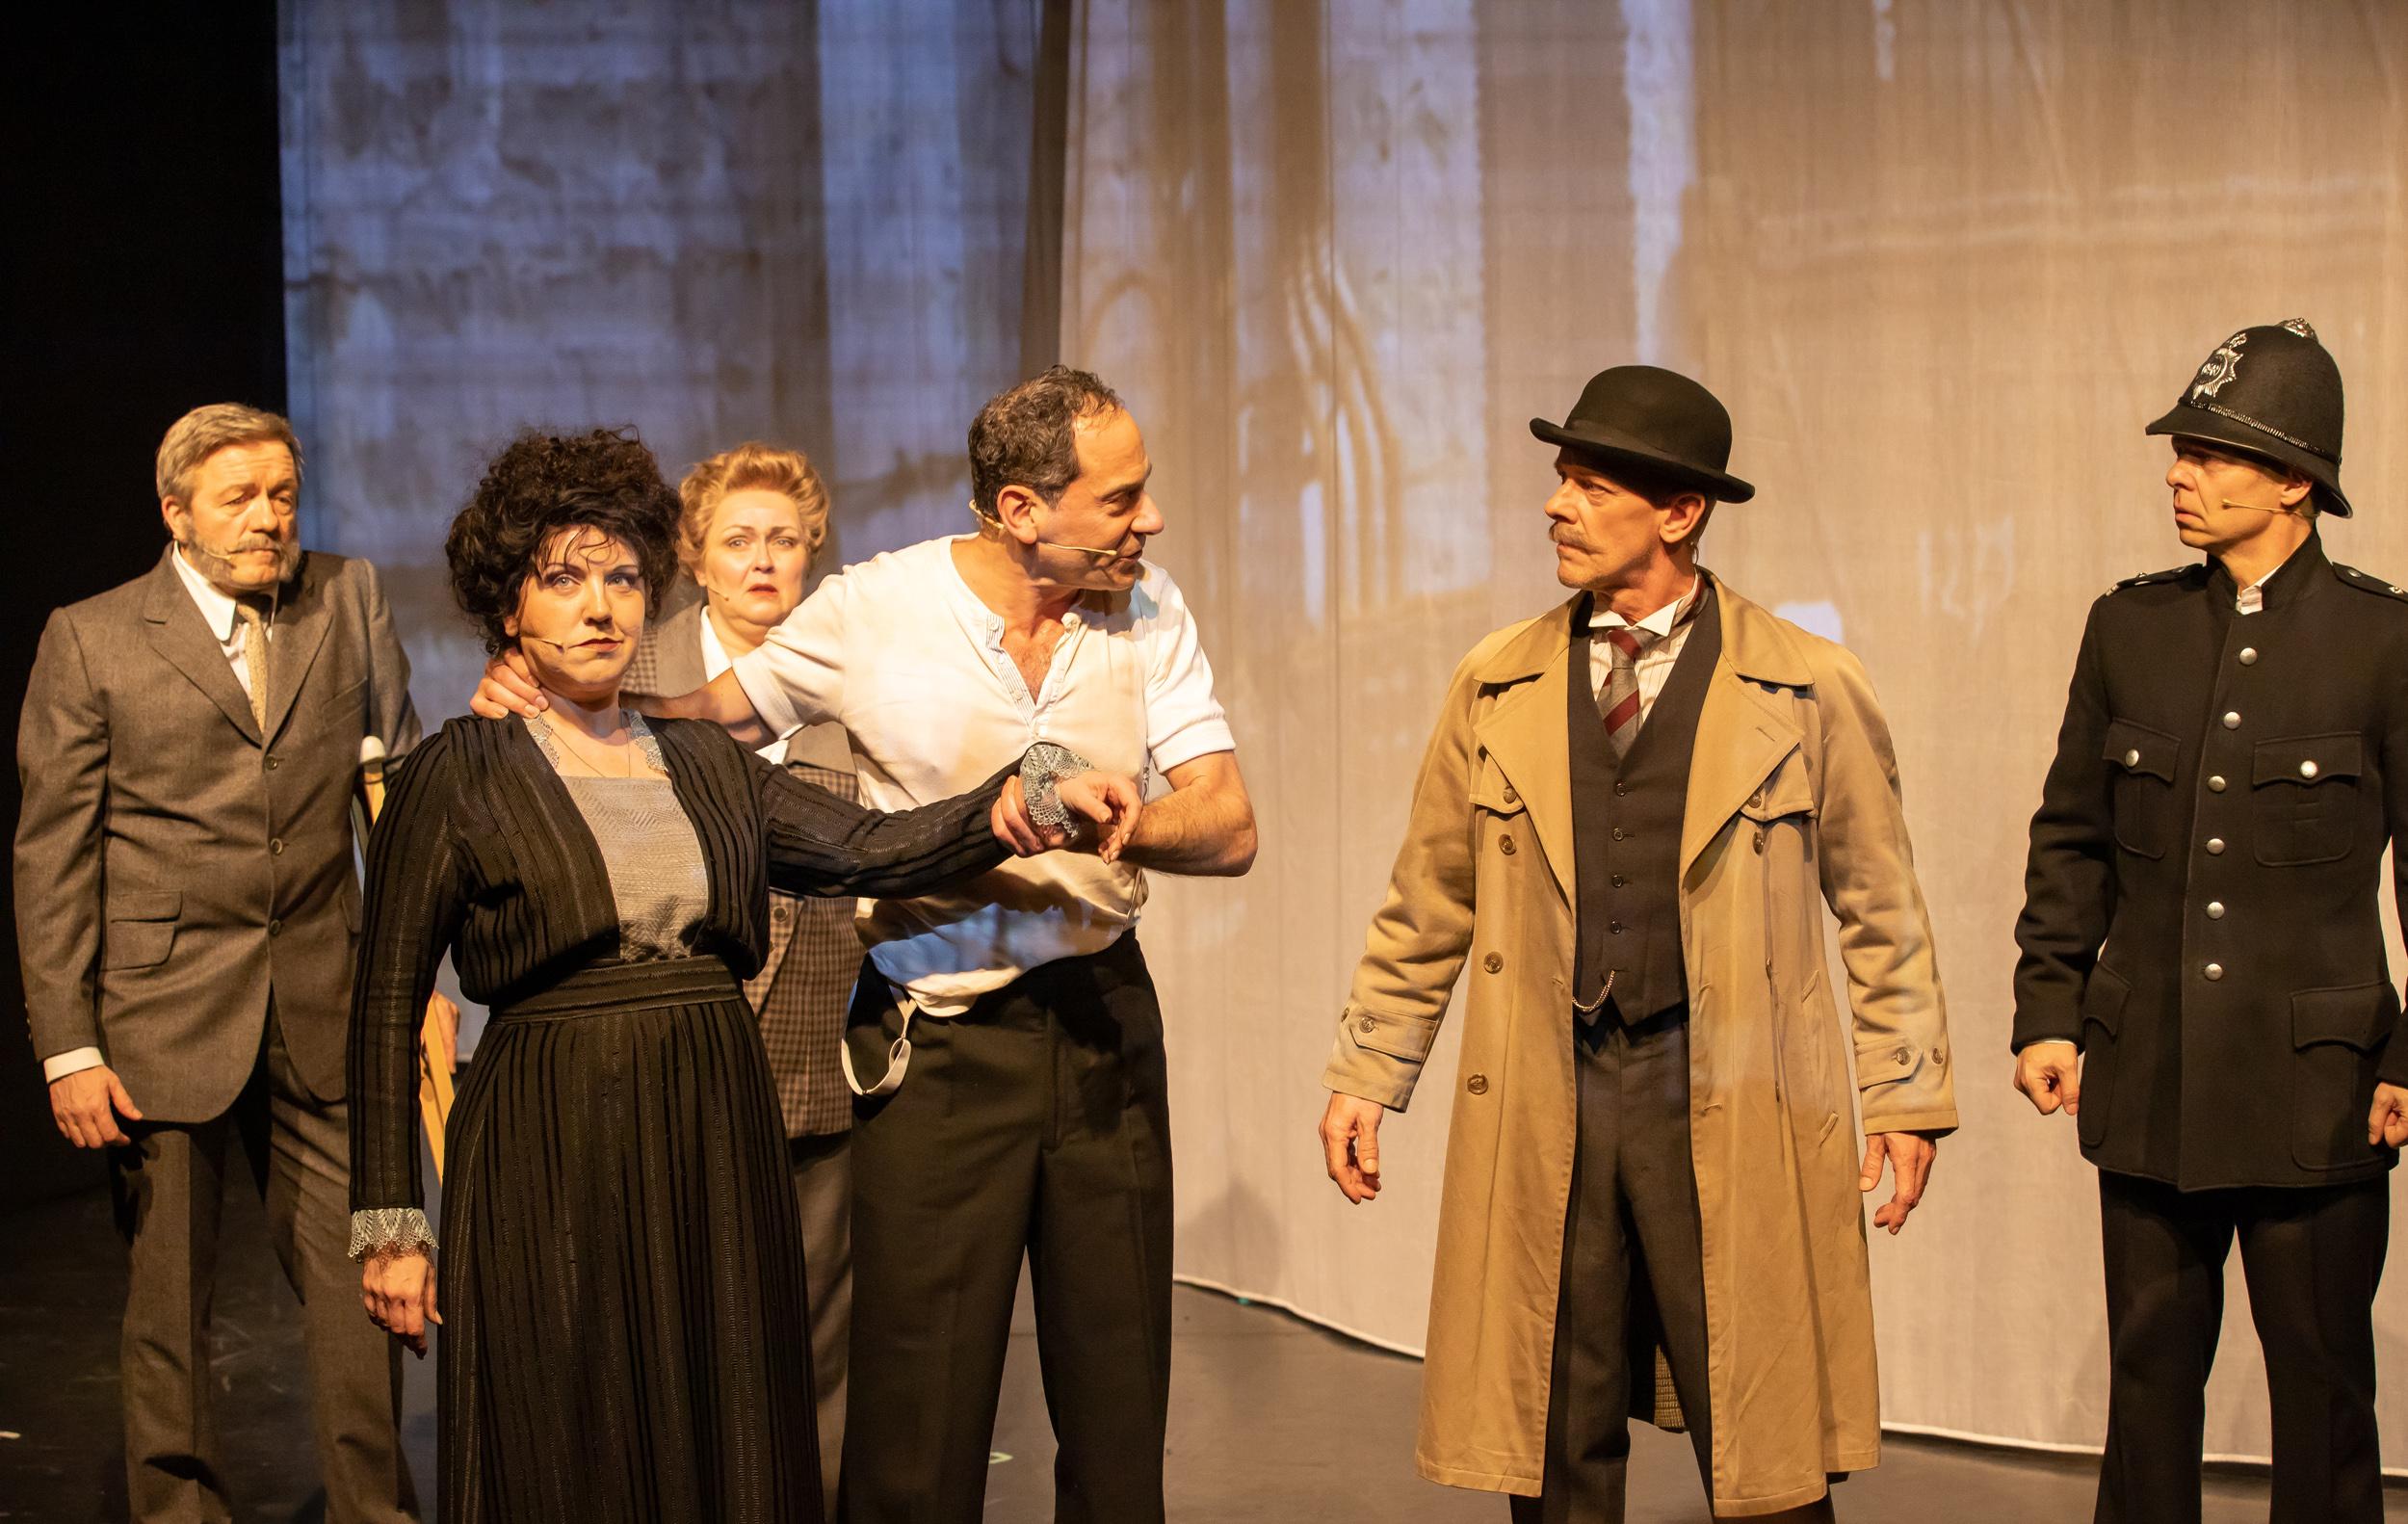 v.l.n.r. Watson (F. Logemann), Mrs. Mason (S. Tschöppe), Miss Hudson (I. Schumacher), Sherlock Holmes (E. Freeman), Inspector Lestrade (O. Meyer) + O'Neil (M. Clauder) © Mirco Wallat